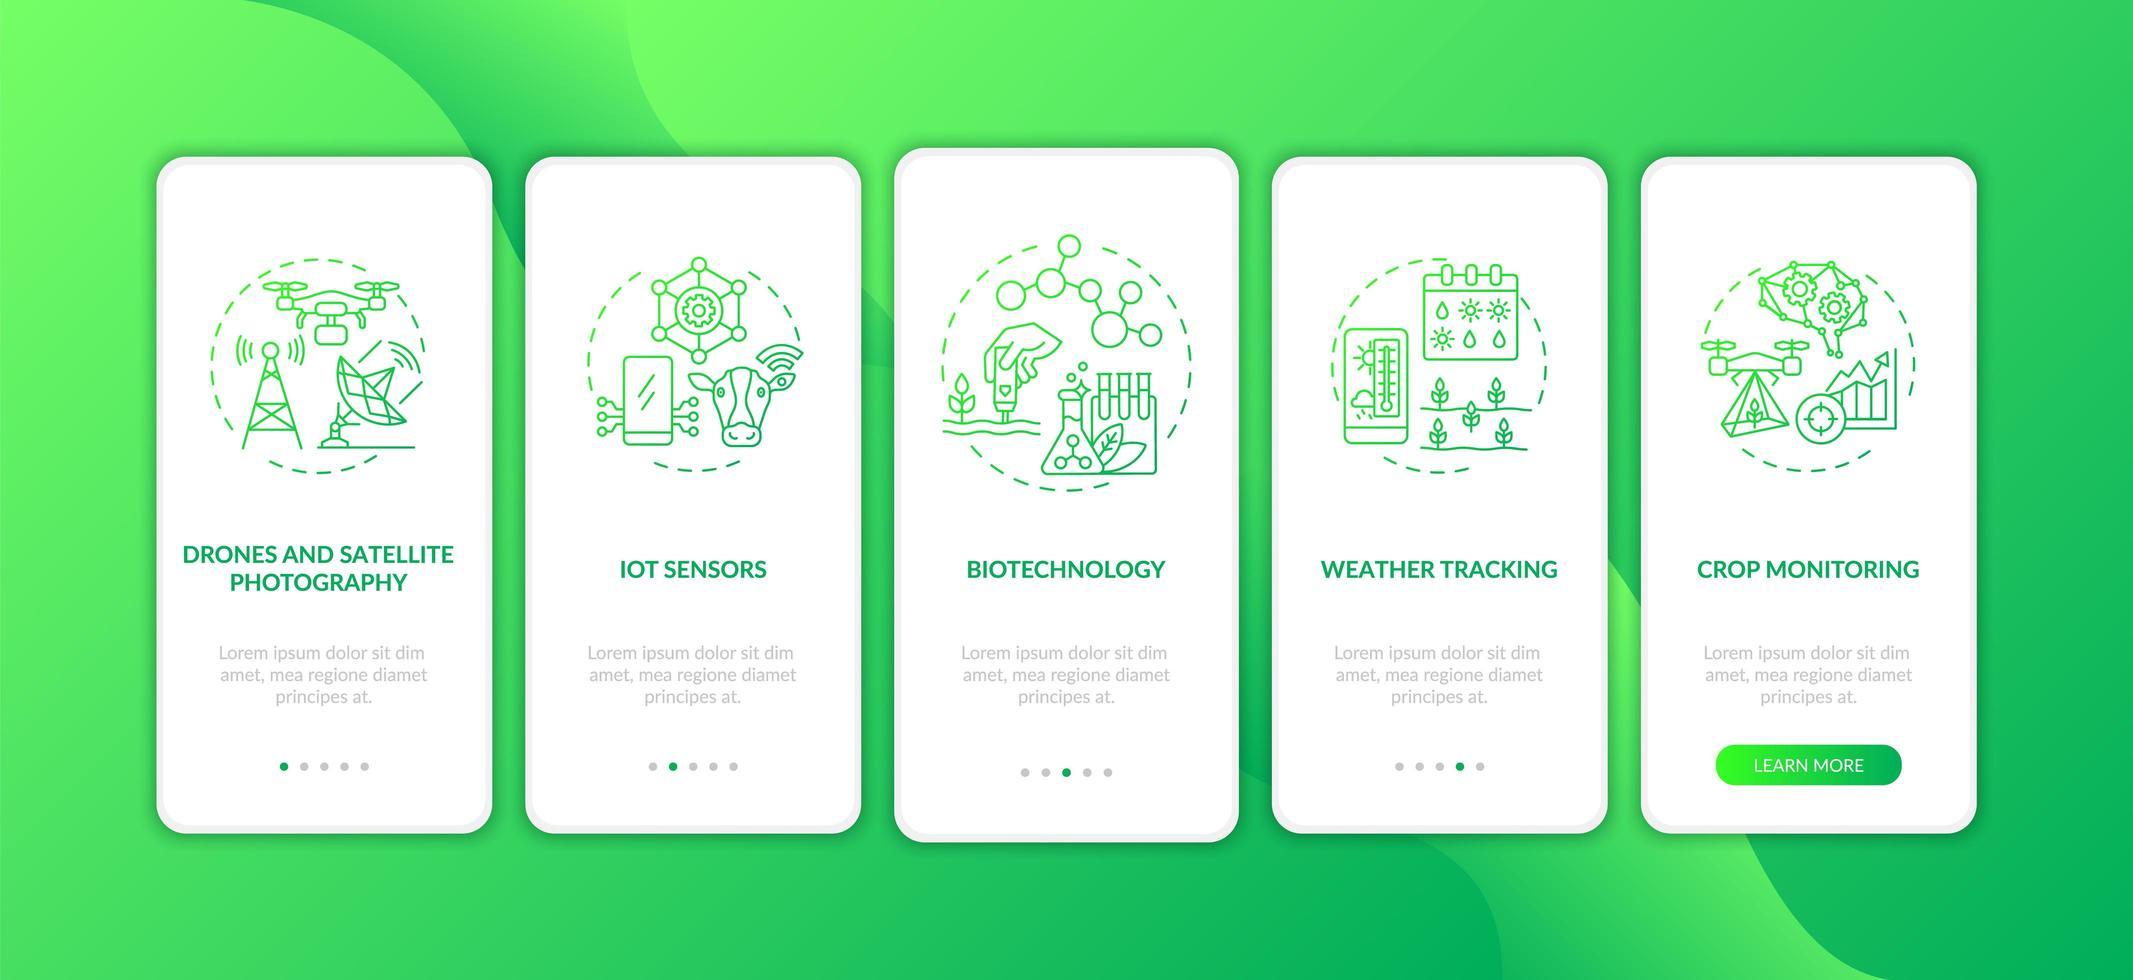 innovativ jordbruksteknik ombord mobilappsskärm med koncept vektor